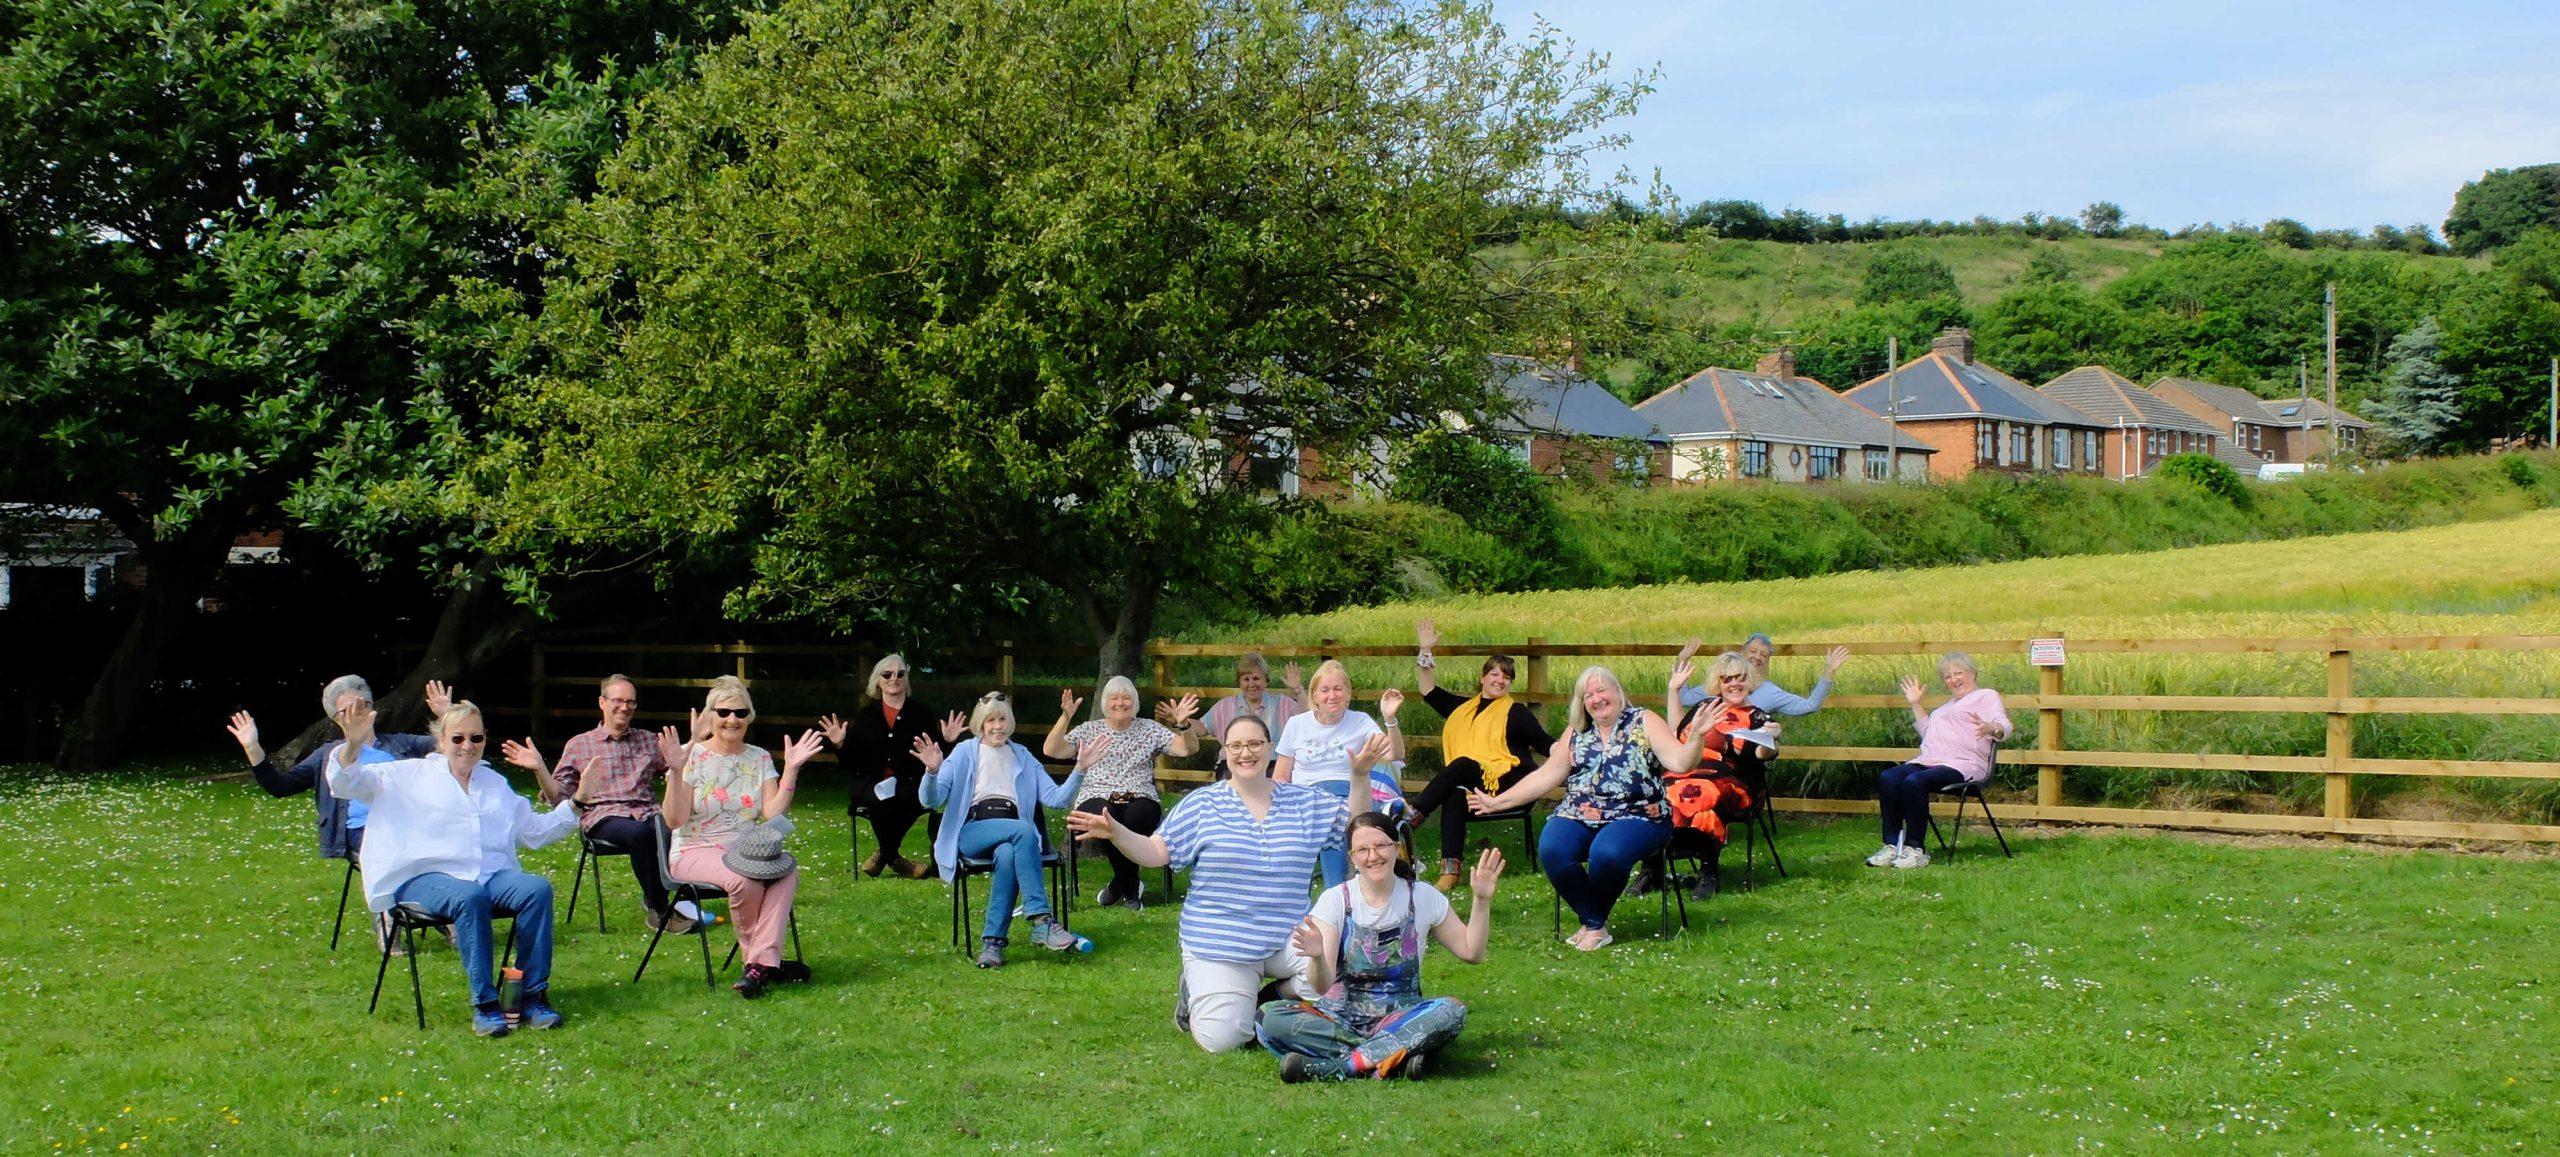 Unity singing outdoors at Pittington Picnic